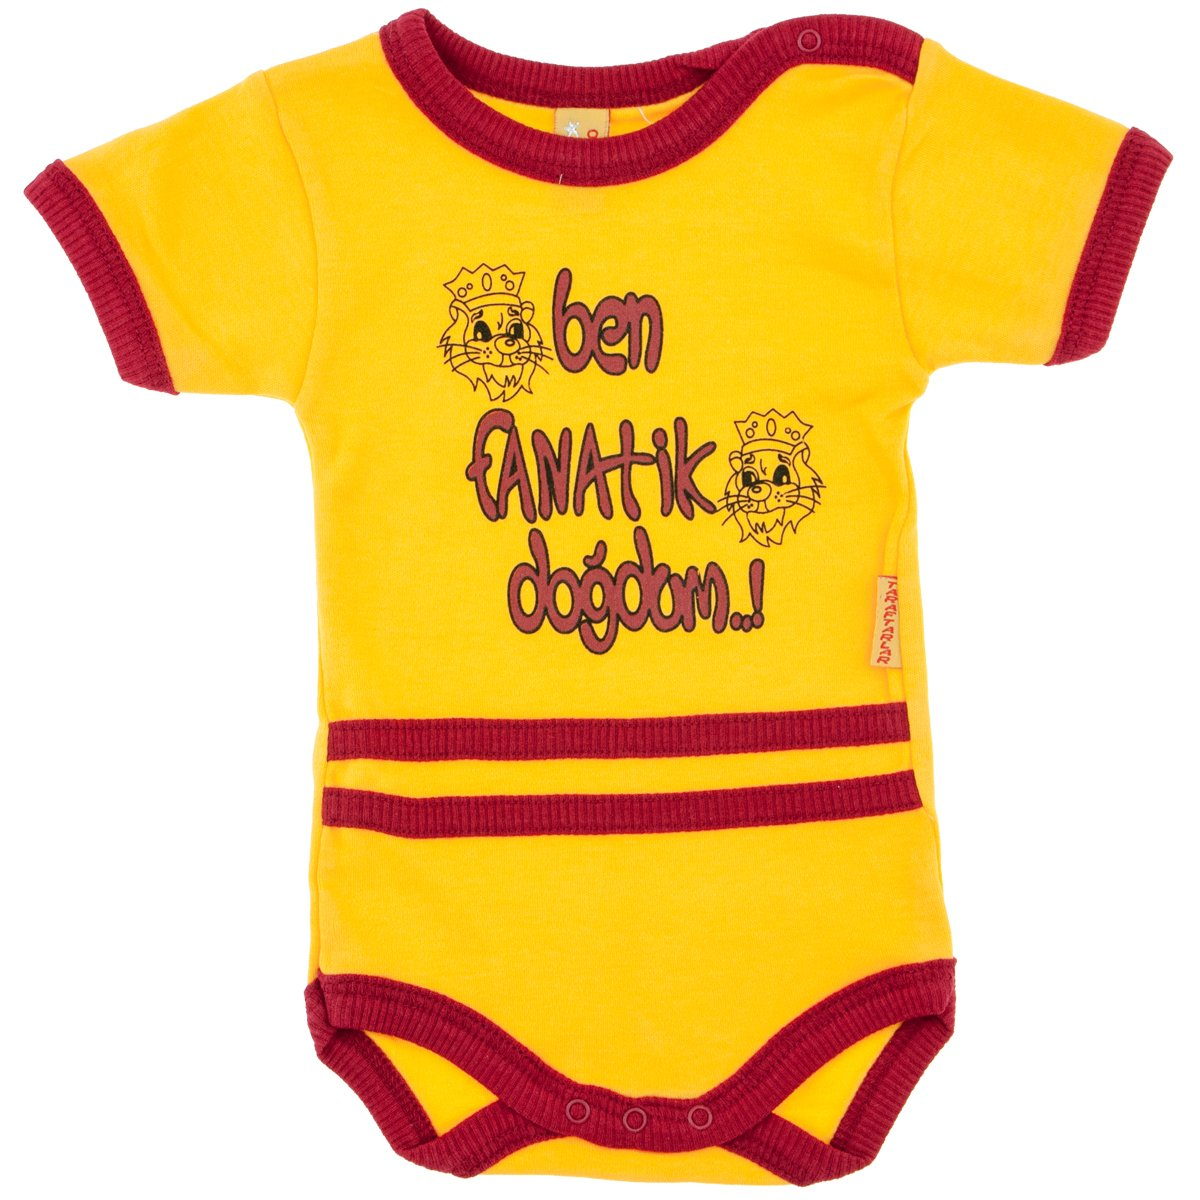 Neco Moden GalatasarayTaraftar Baby Bebek Body Badi Fanatik Sari kanarya Cim Bom Kara Kartal Galatasaray Fenerbahce (12-18 Monate)